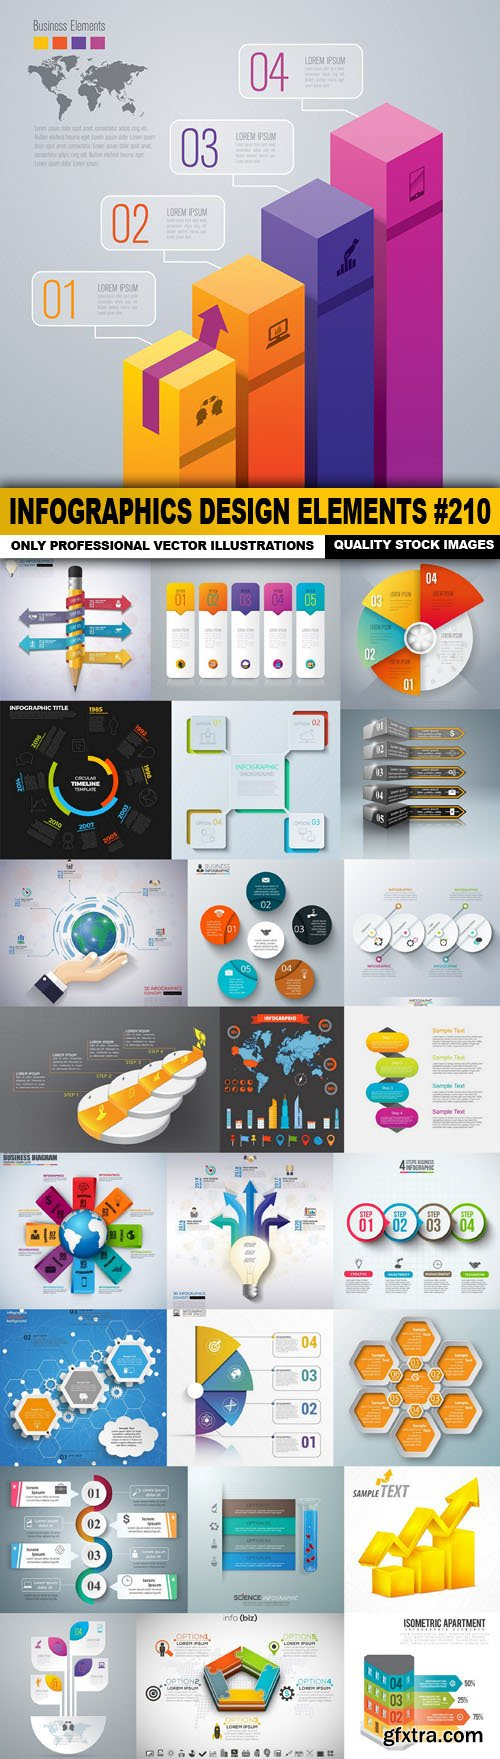 Infographics Design Elements #210 - 25 Vector